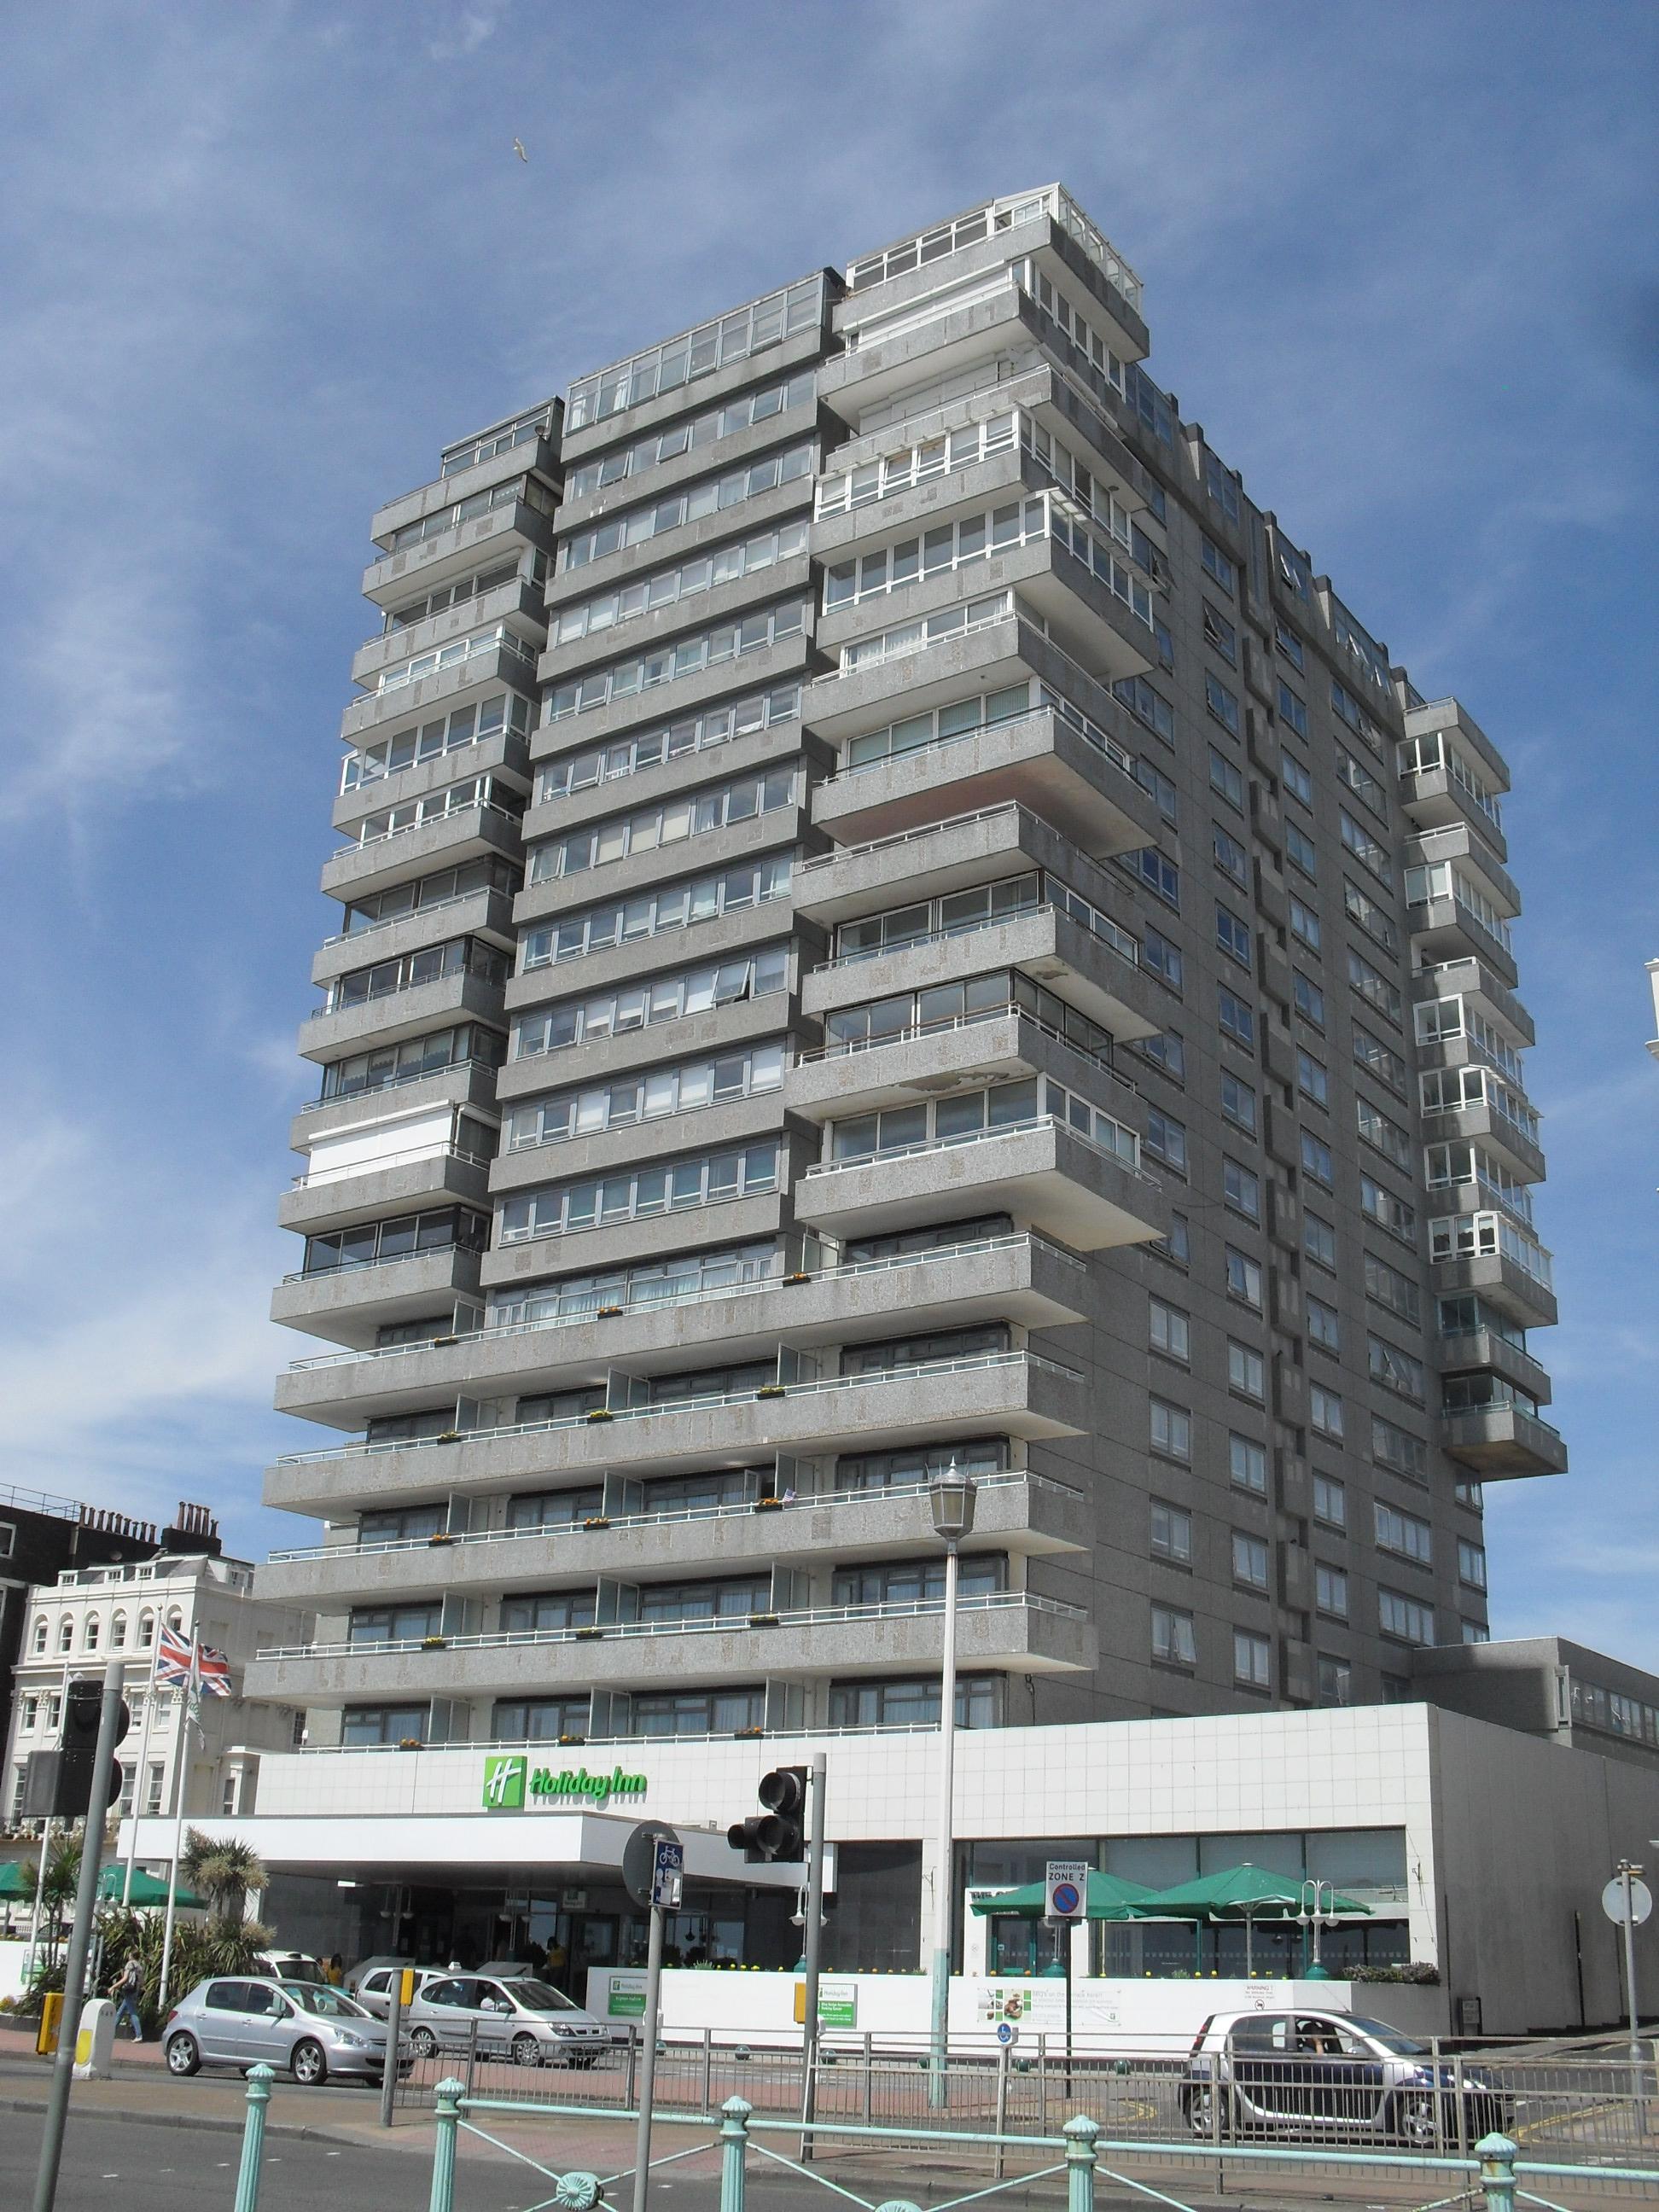 Kings Hotel City M Ef Bf Bdnchen